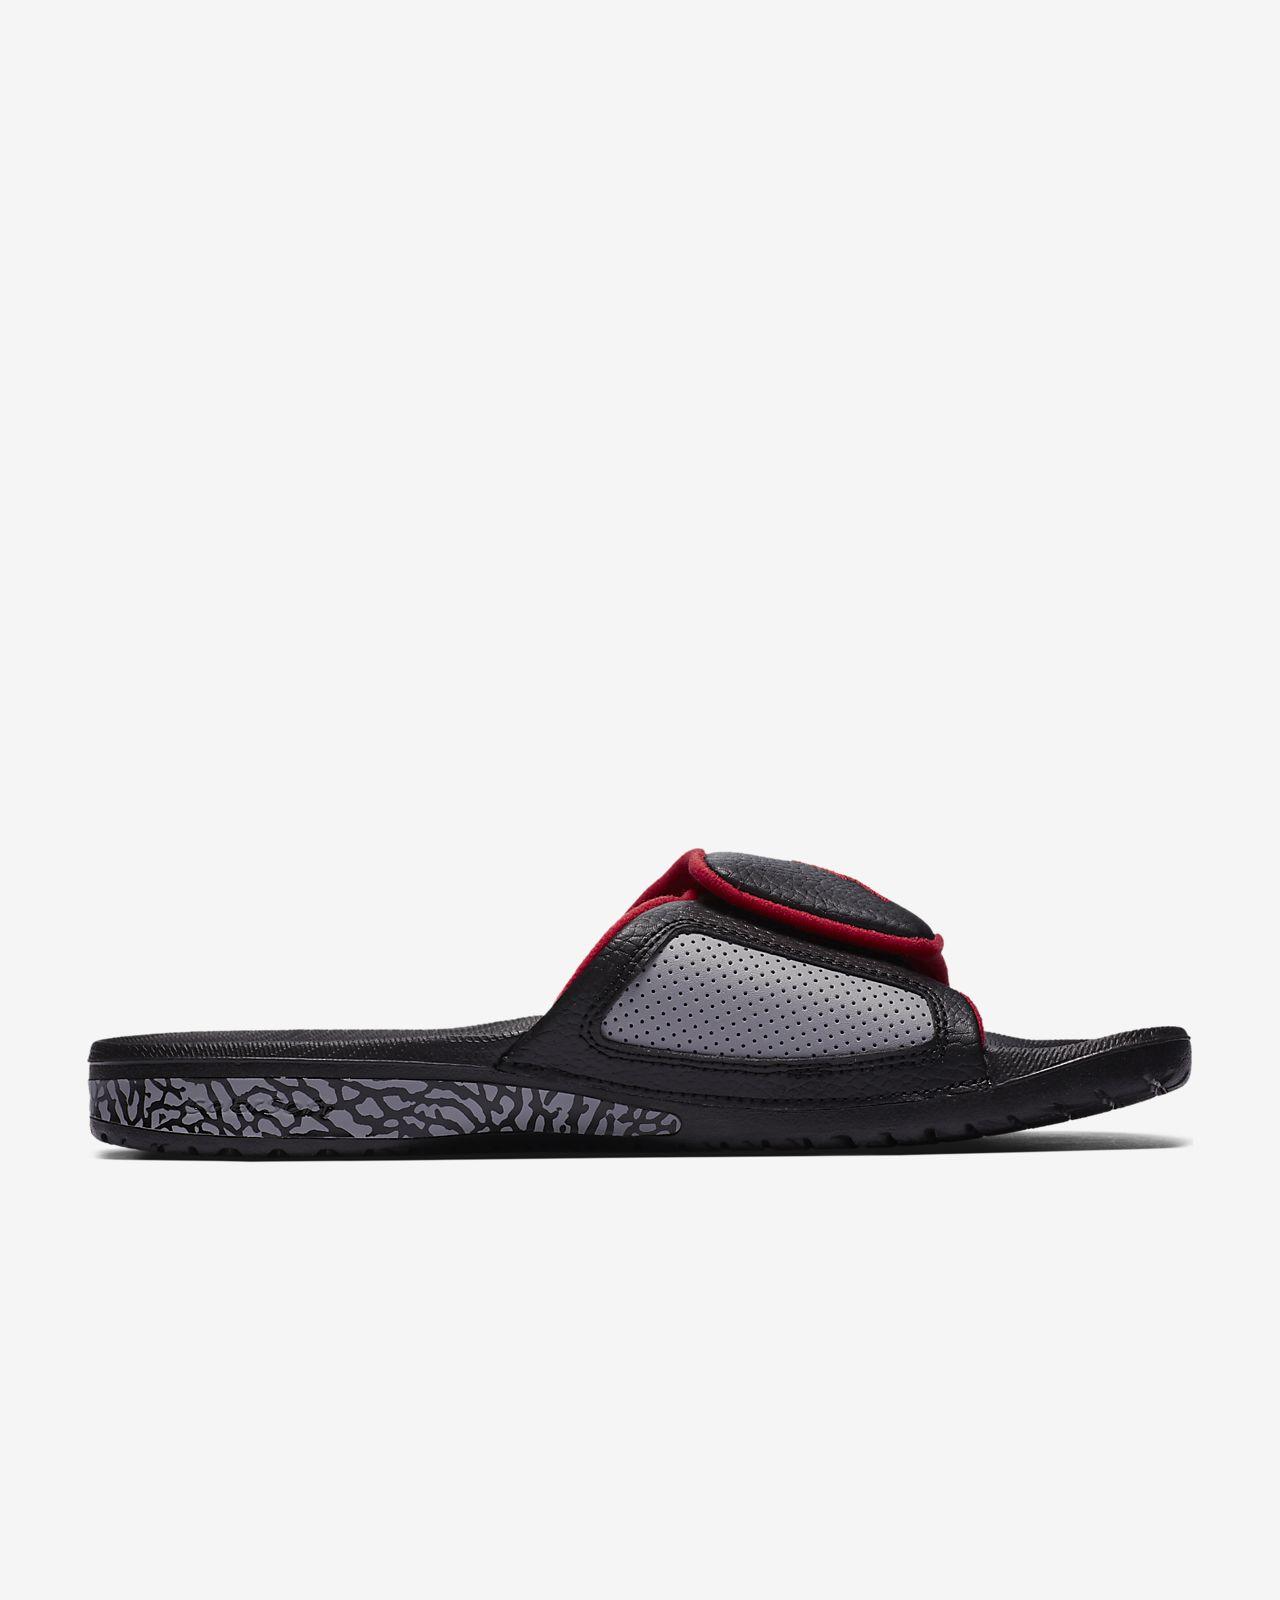 875d3816cc689 Jordan Hydro III Retro Men s Slide. Nike.com MY